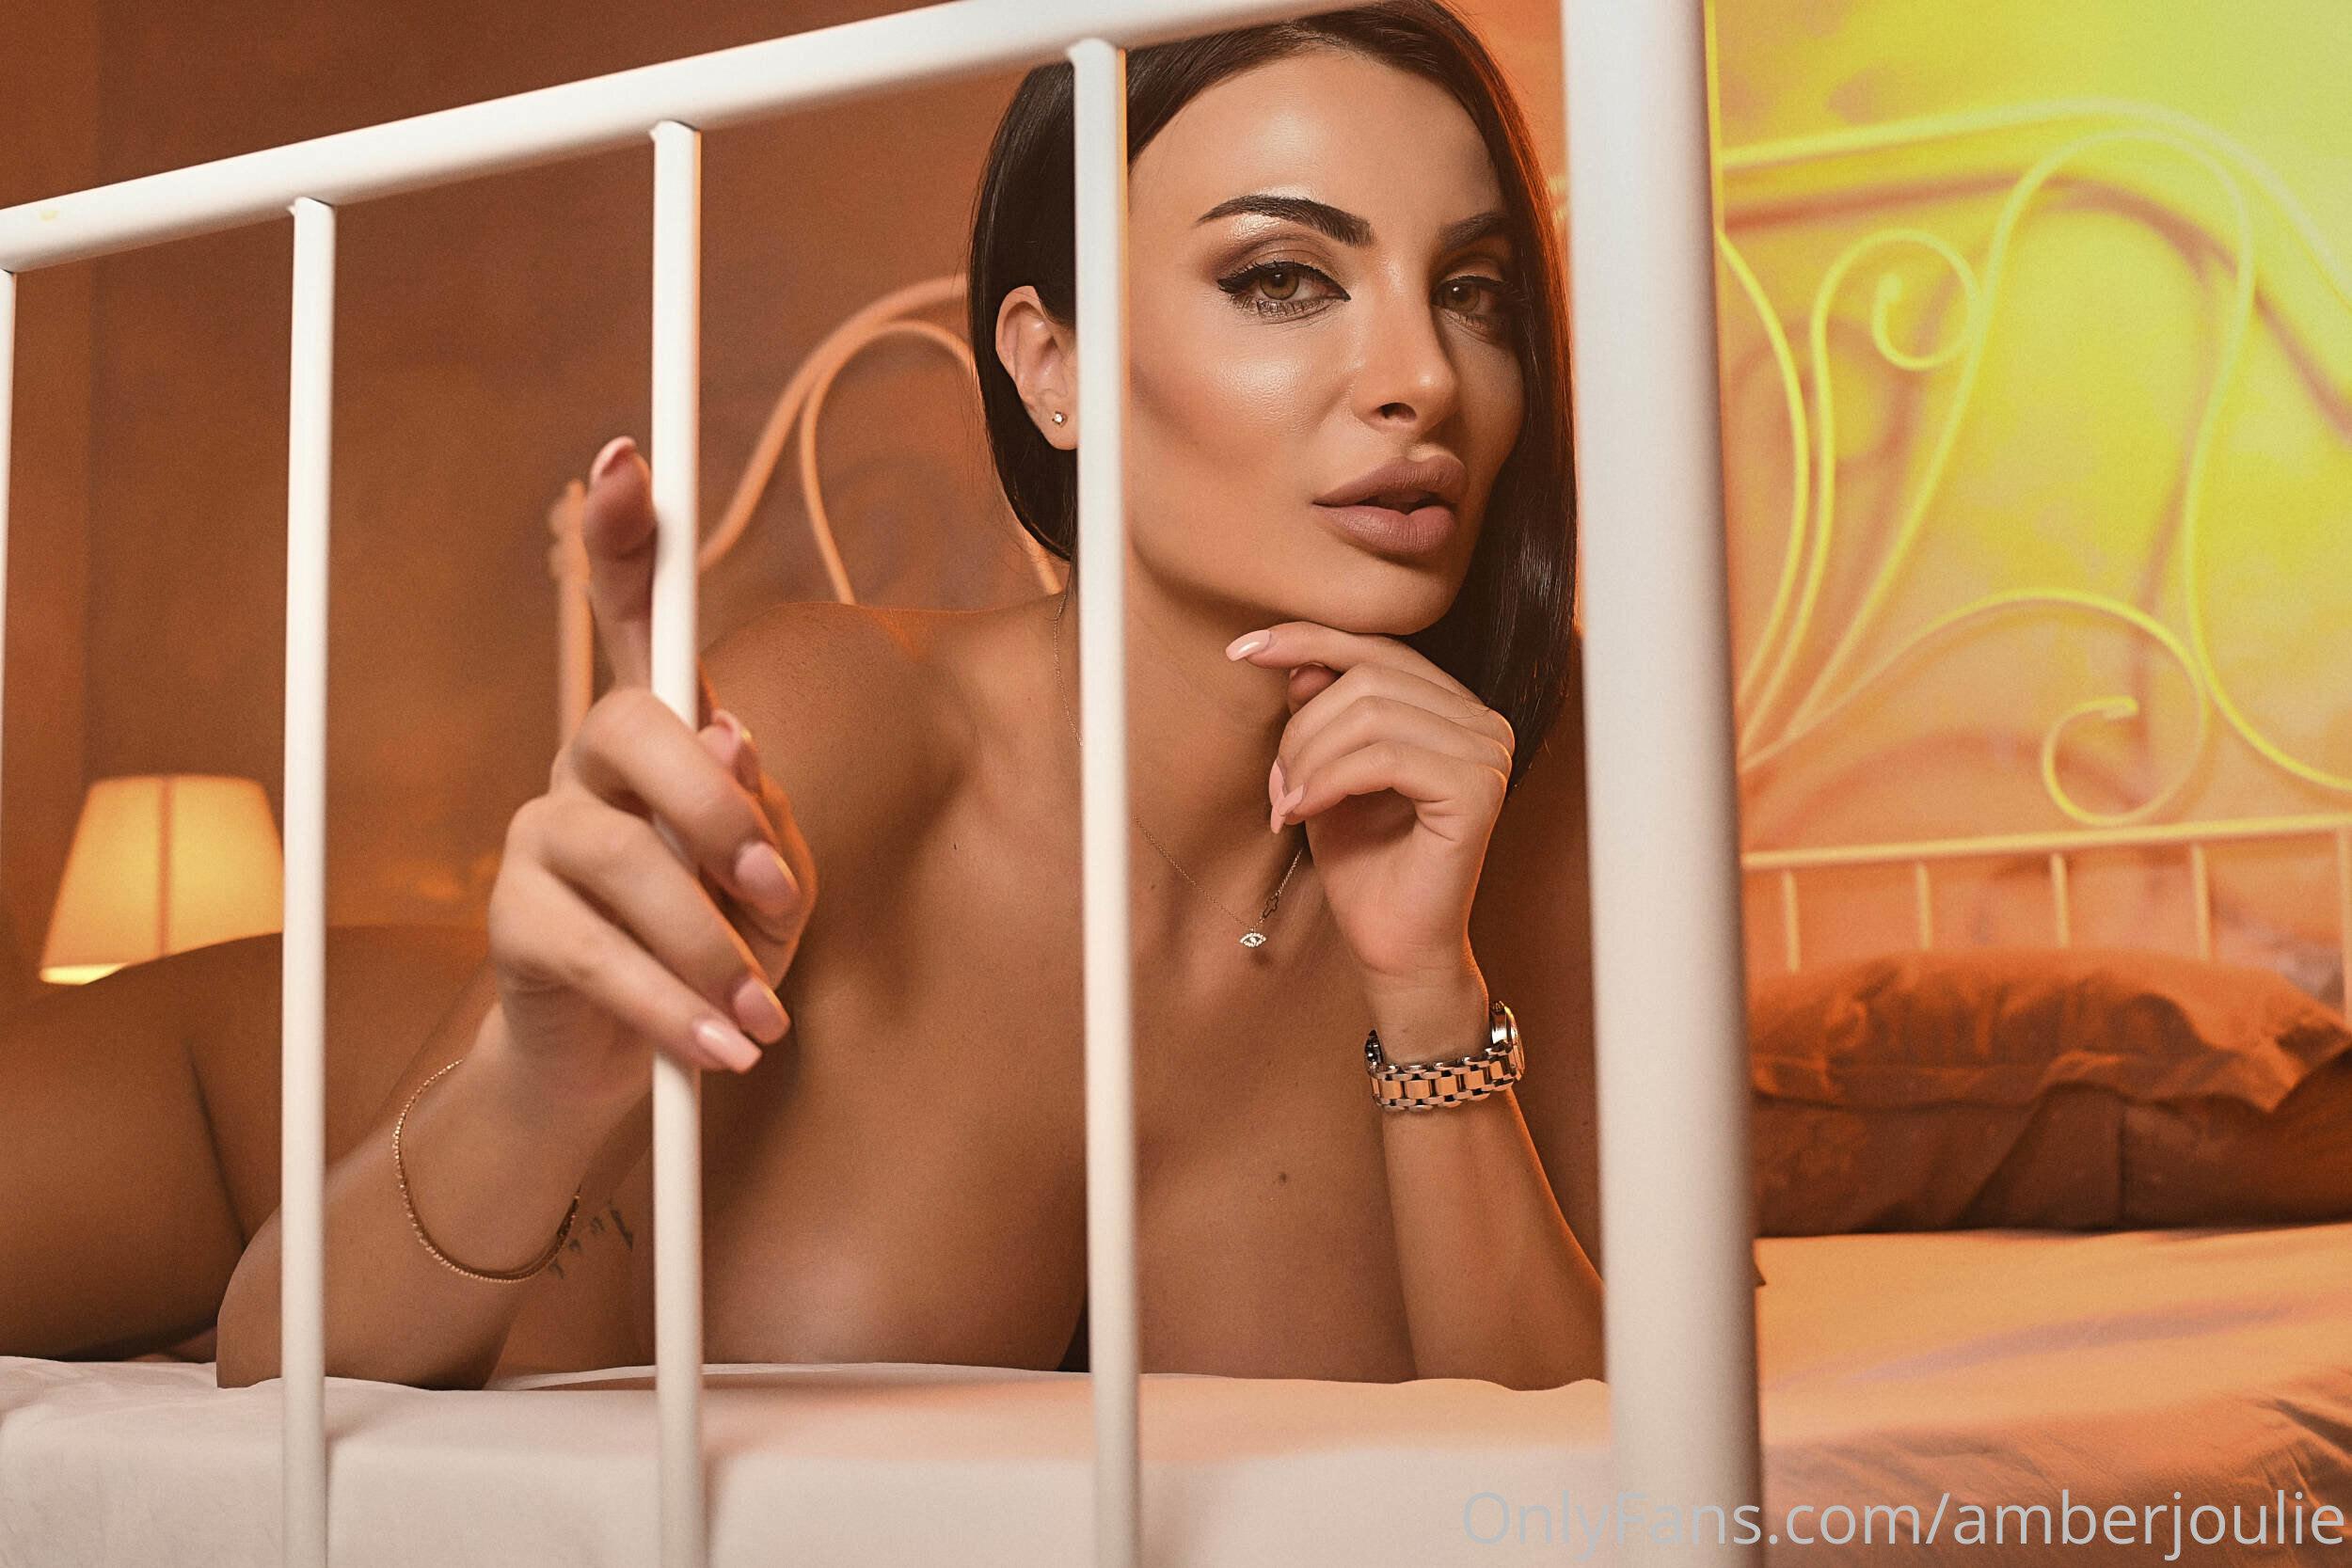 @amberjoulie nude photo 50